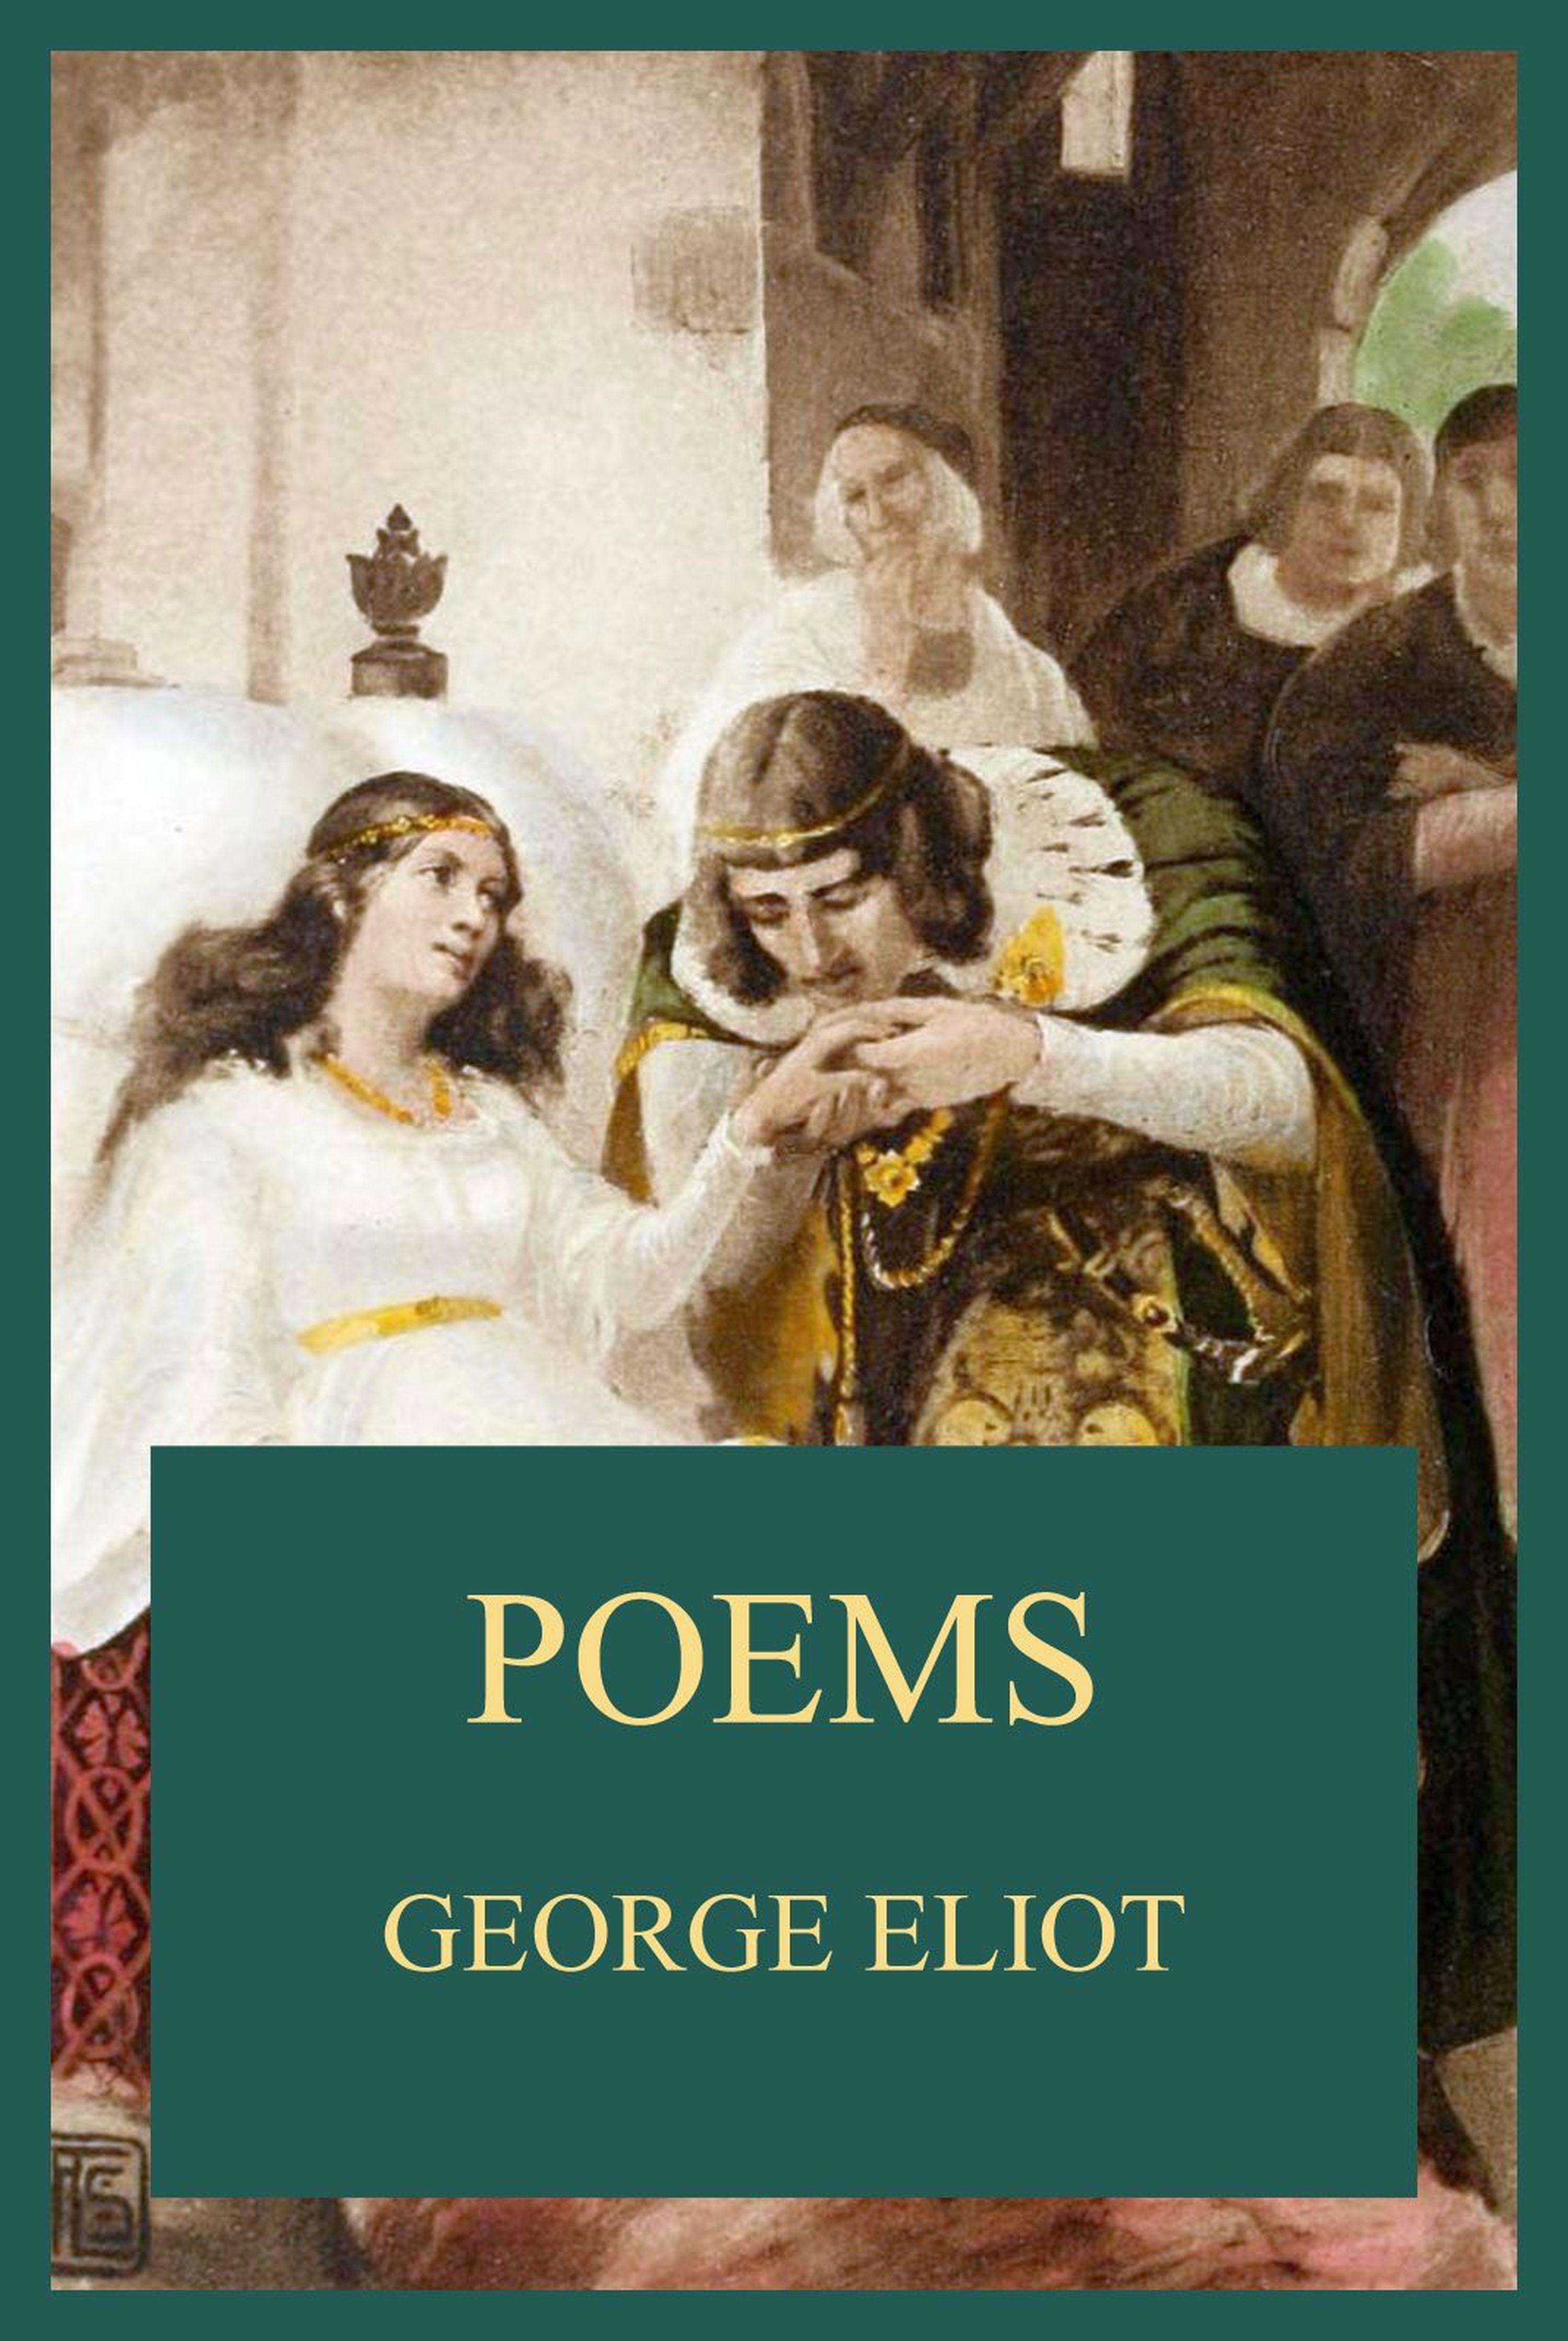 George Eliot Poems